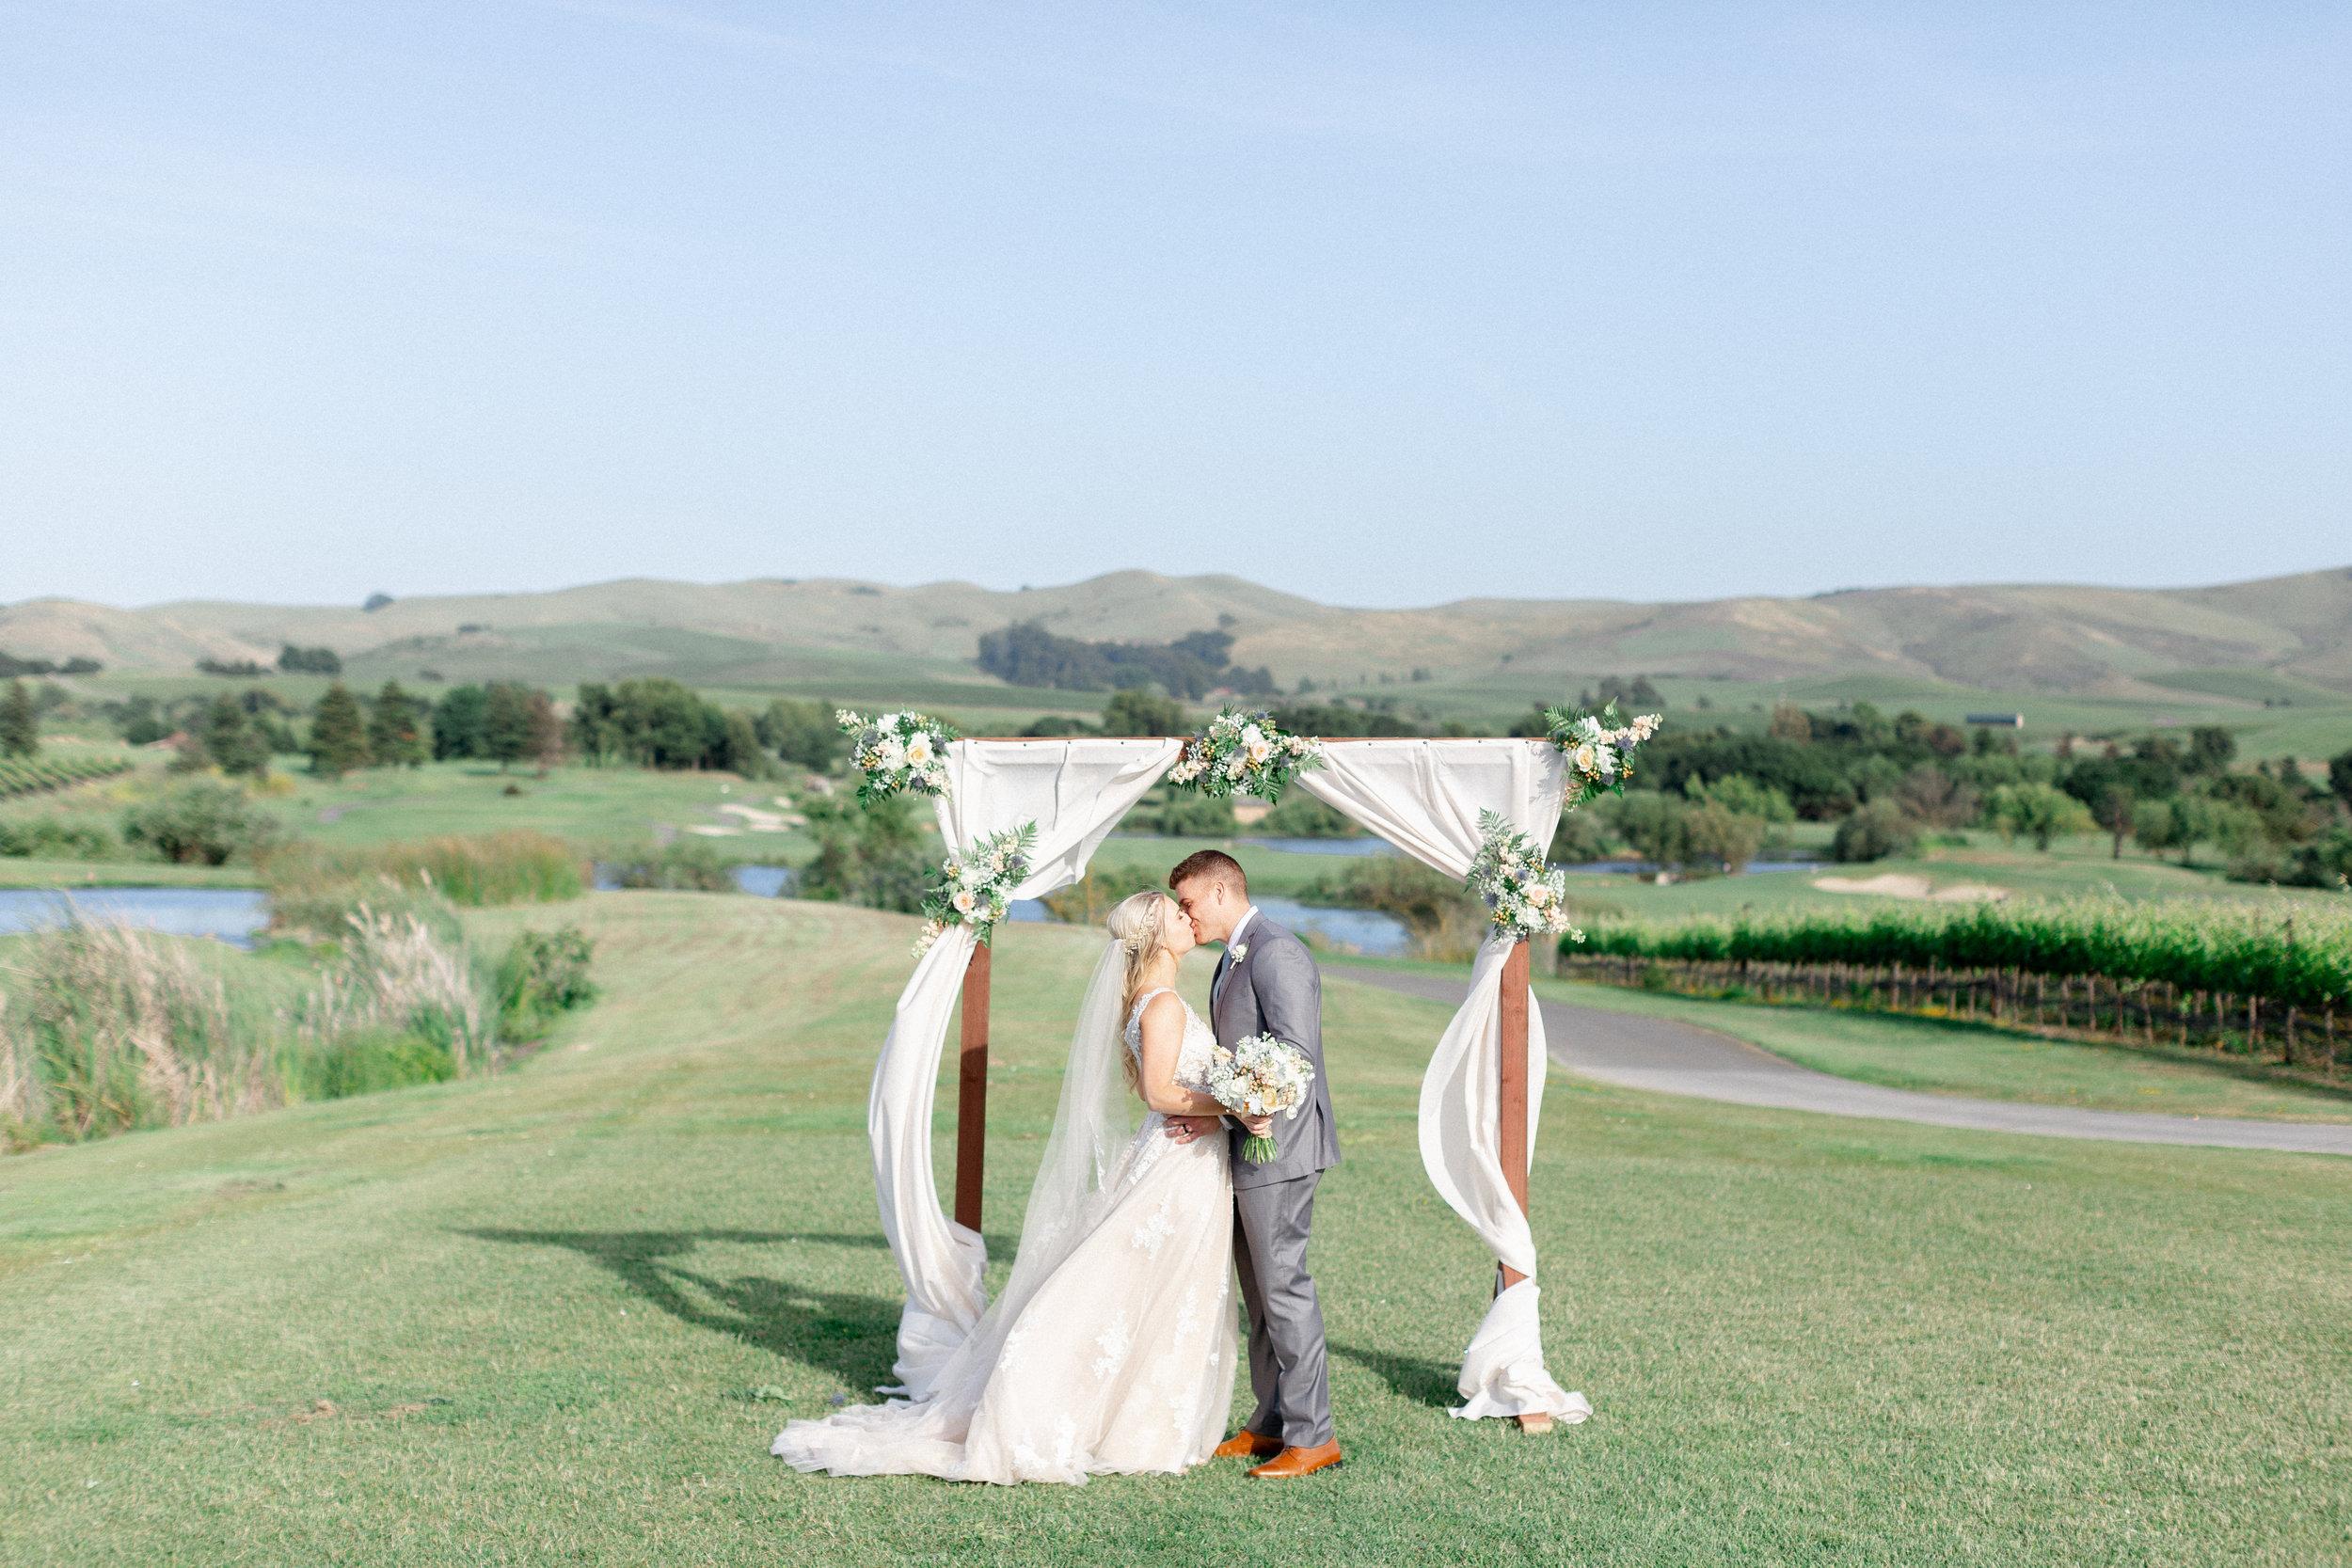 Eagle-Vines-Golf-Course-wedding-photographer (128 of 206).jpg